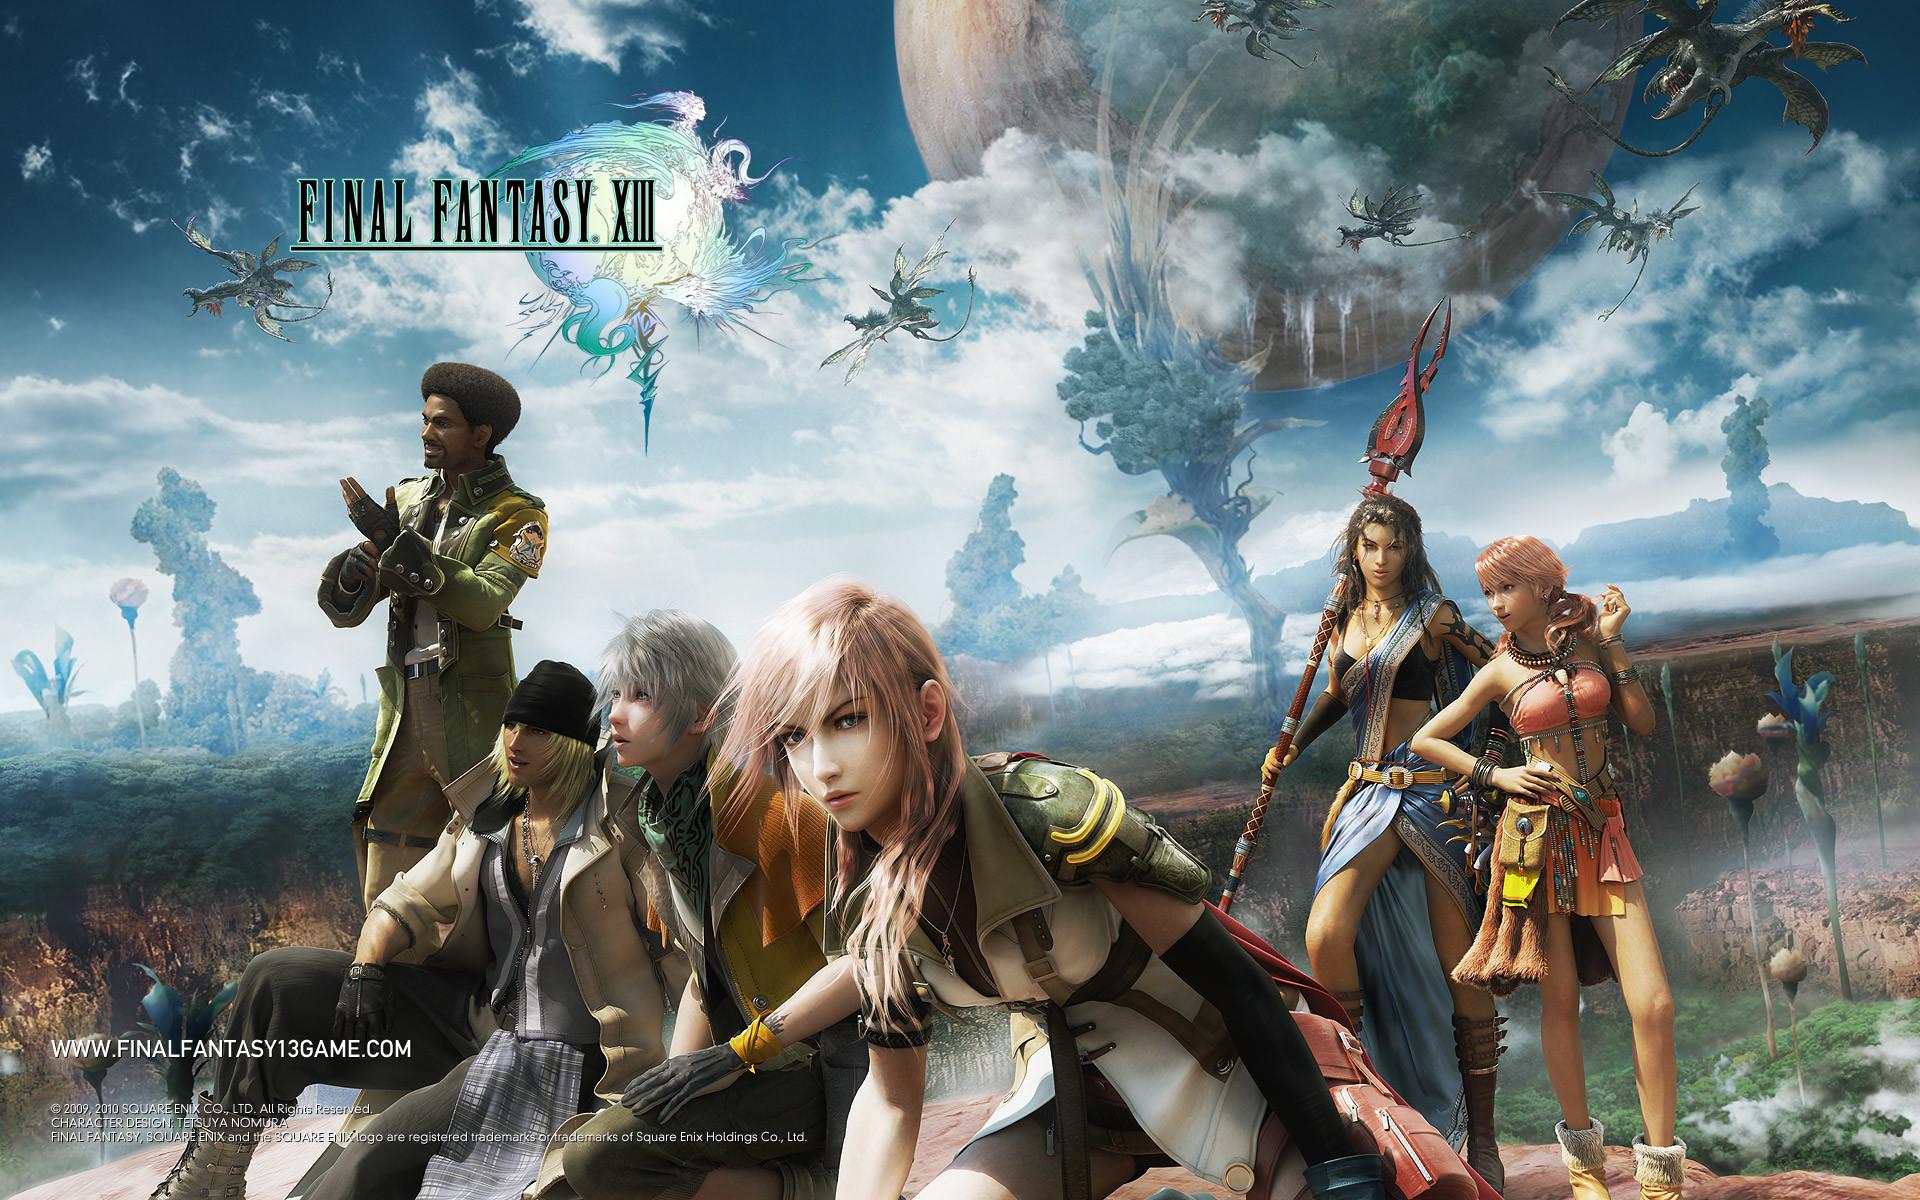 Final Fantasy Wallpapers – FFXIII